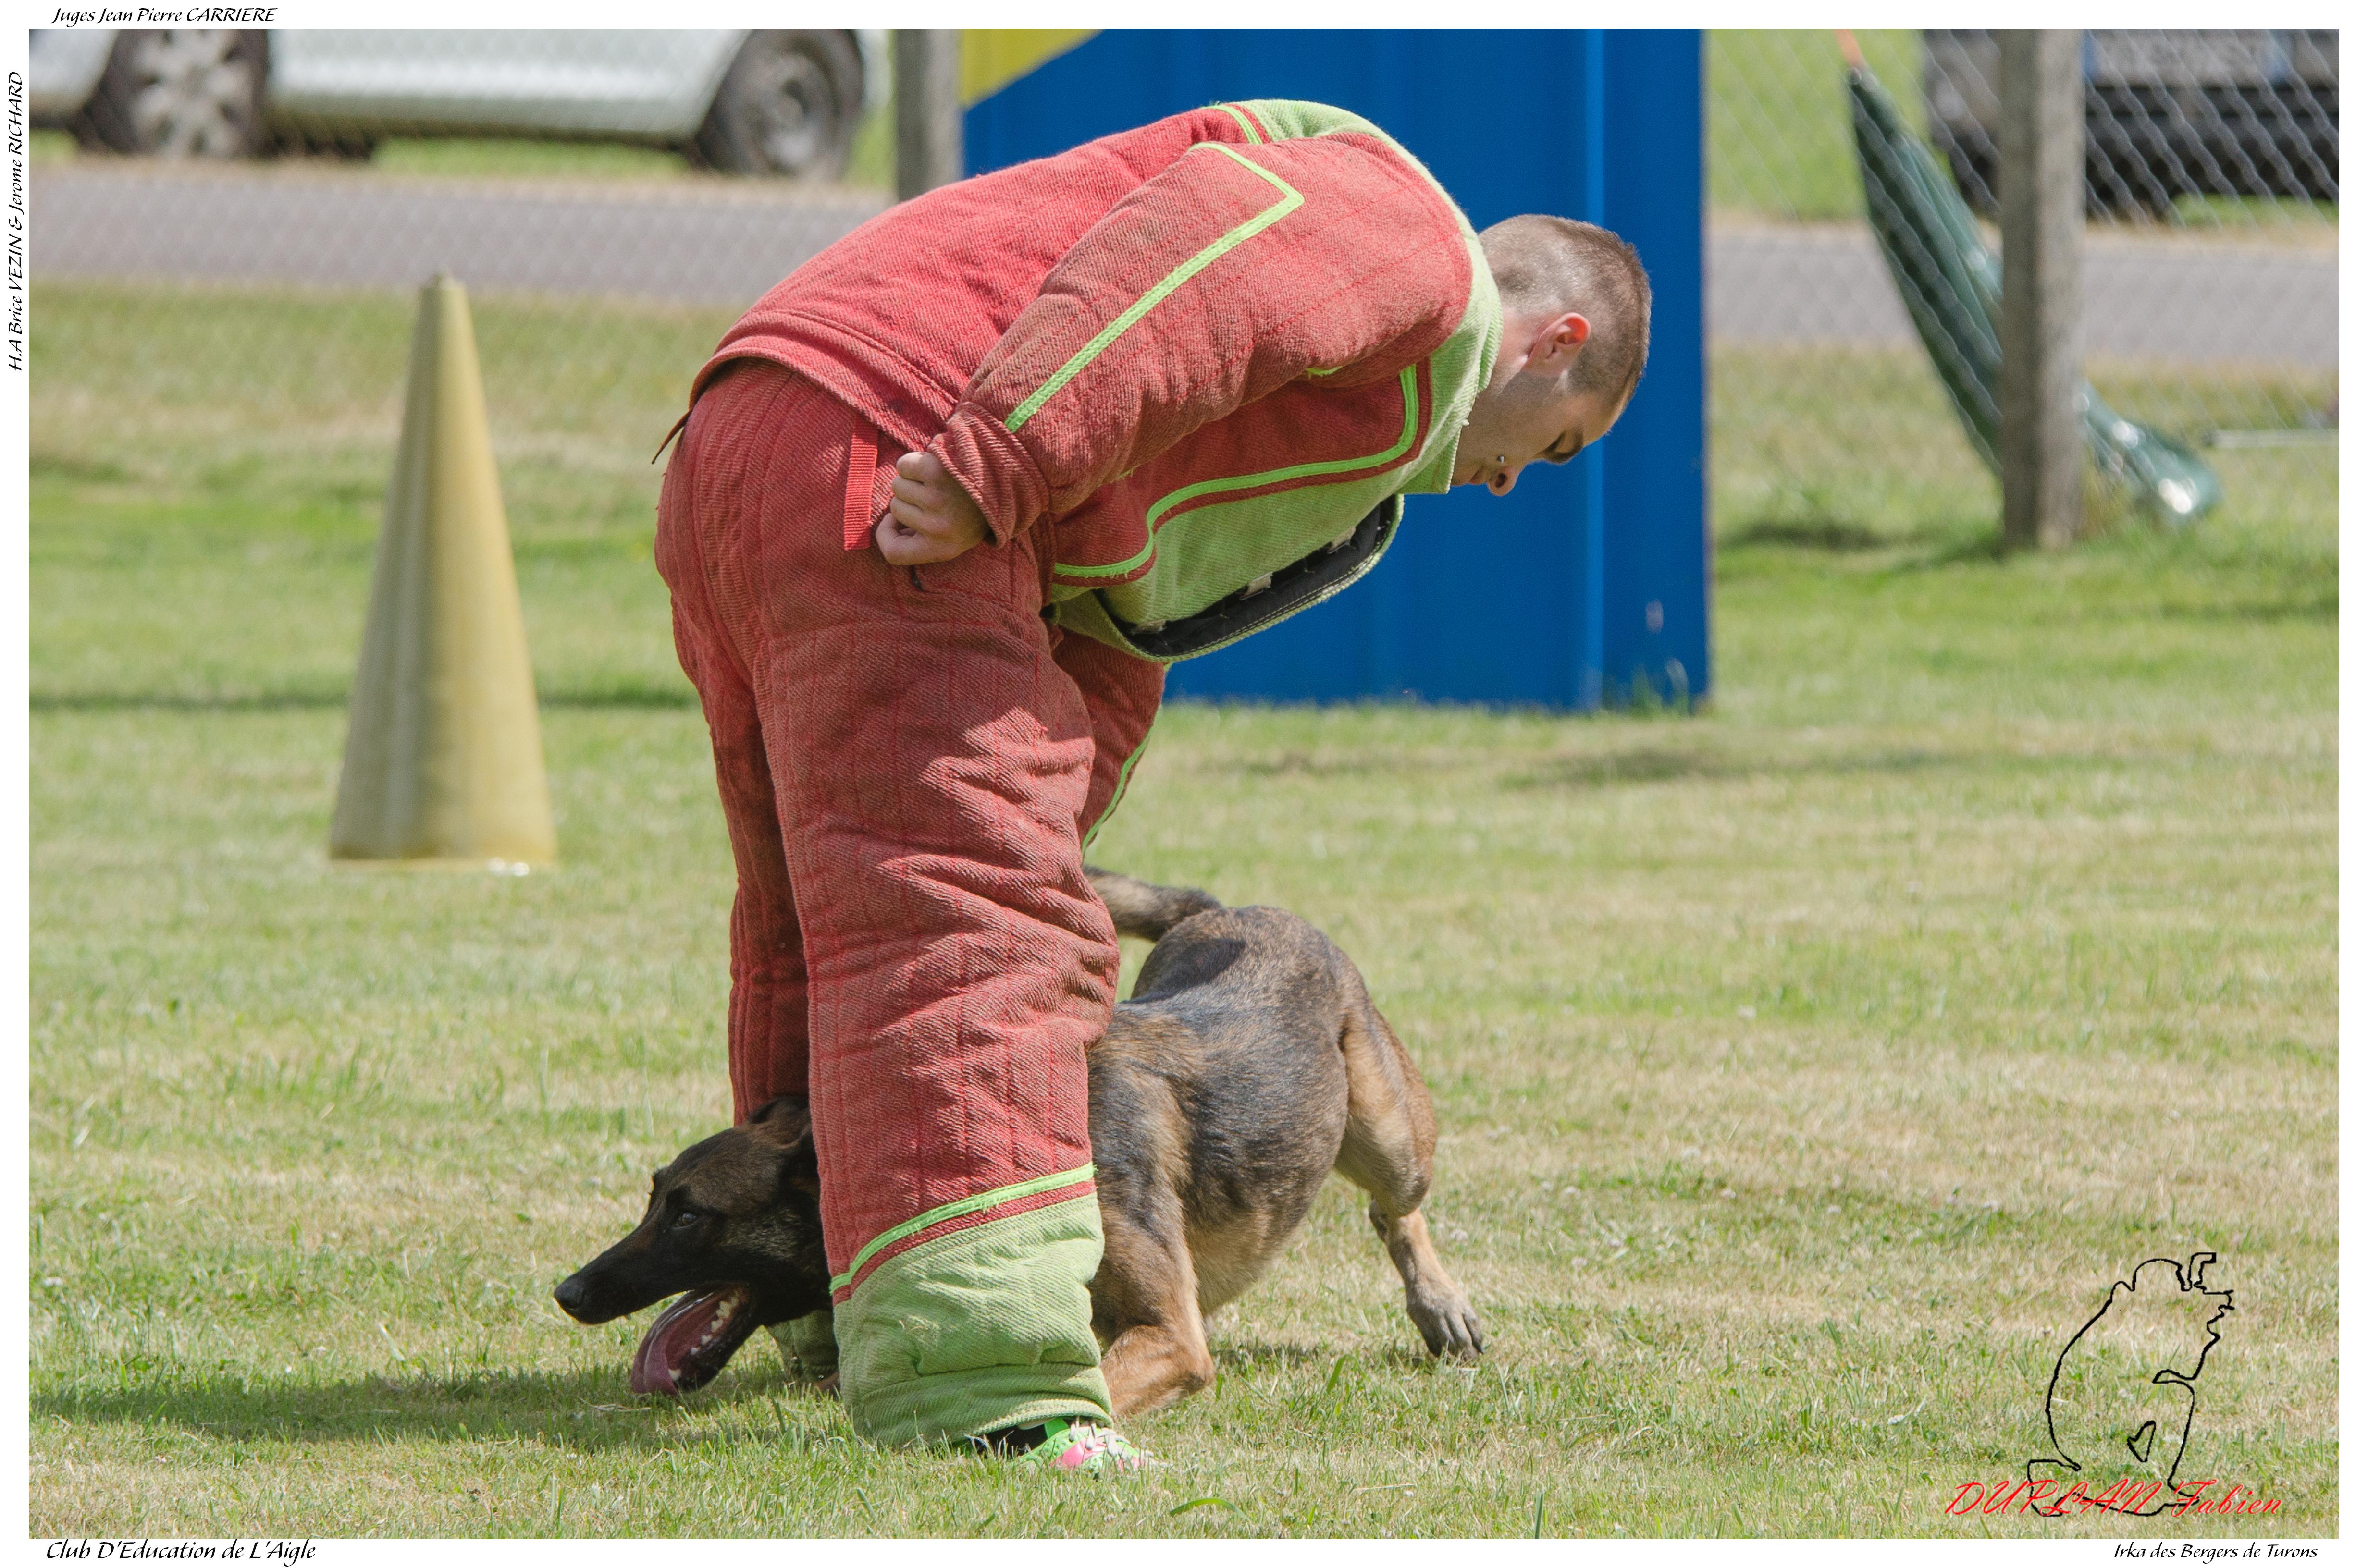 Irka des Bergers de Turons PILON G --3671, Animal, Dog, Outdoor, Pet, HQ Photo